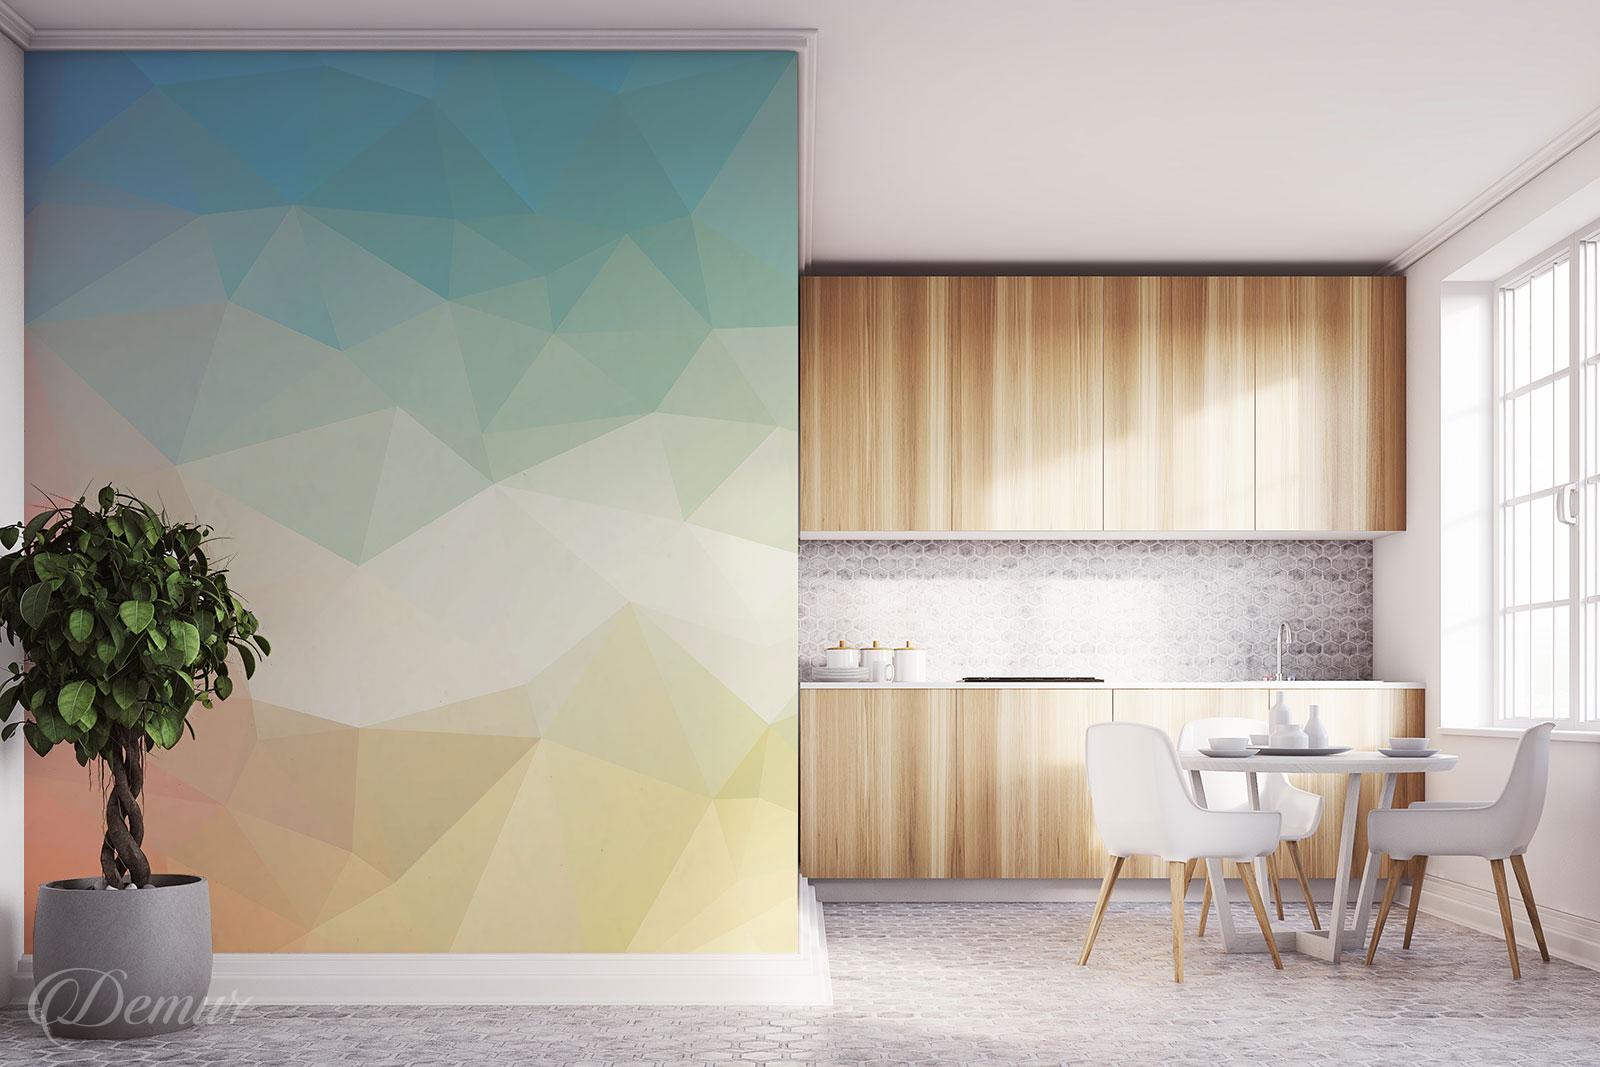 Fototapeta Pastelowa Geometria - Fototapety do kuchni laminowane - Demur